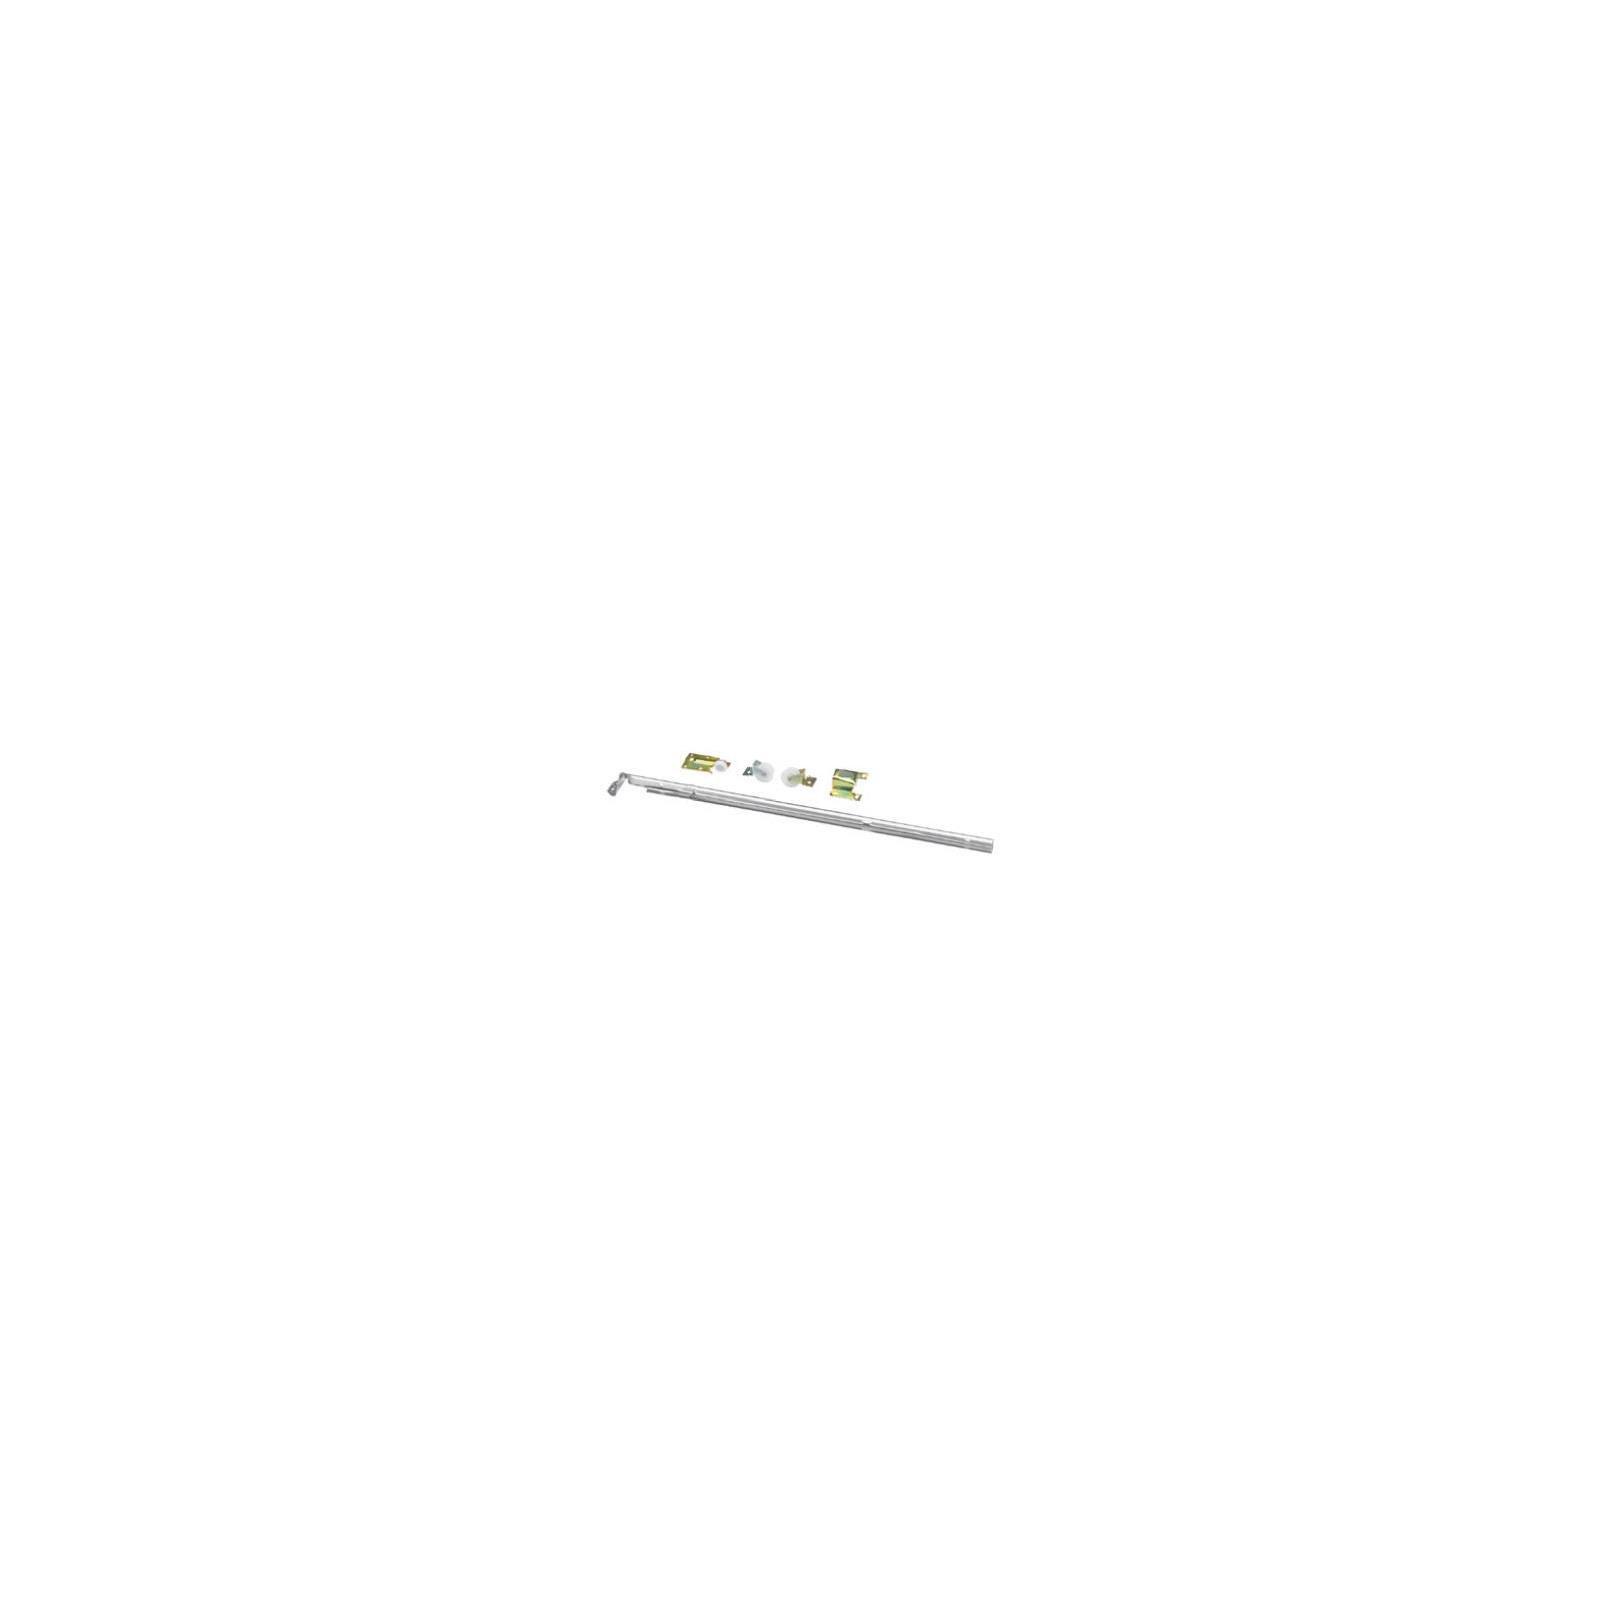 BRAINERD/LIBERTY HDW 69757 22'' Center Draw Slide